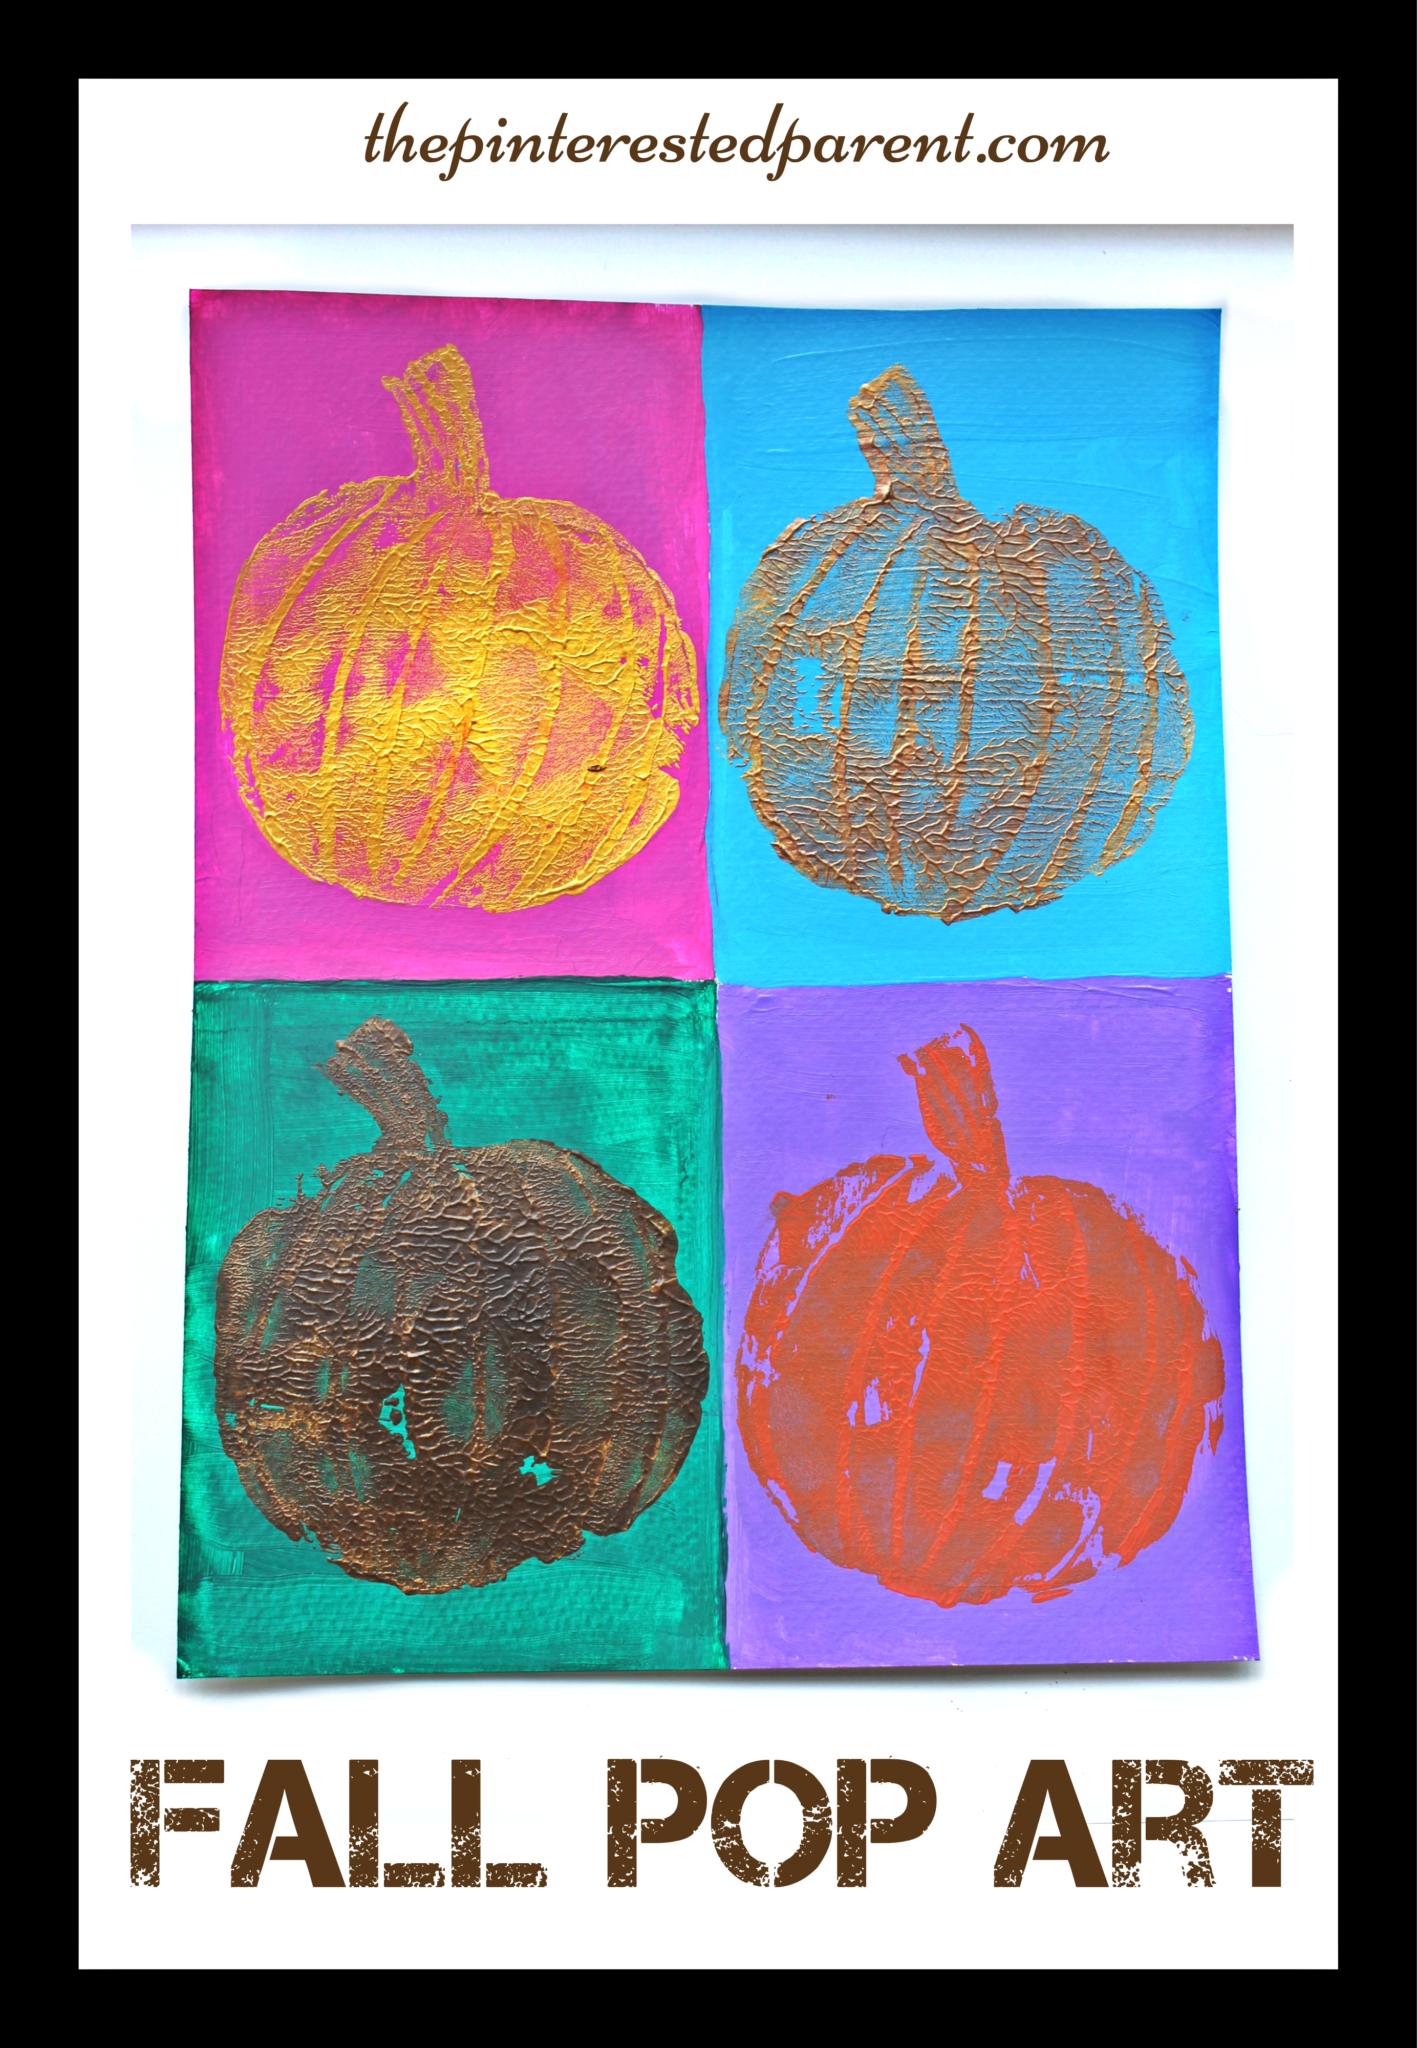 Andy Warhol Arts And Crafts